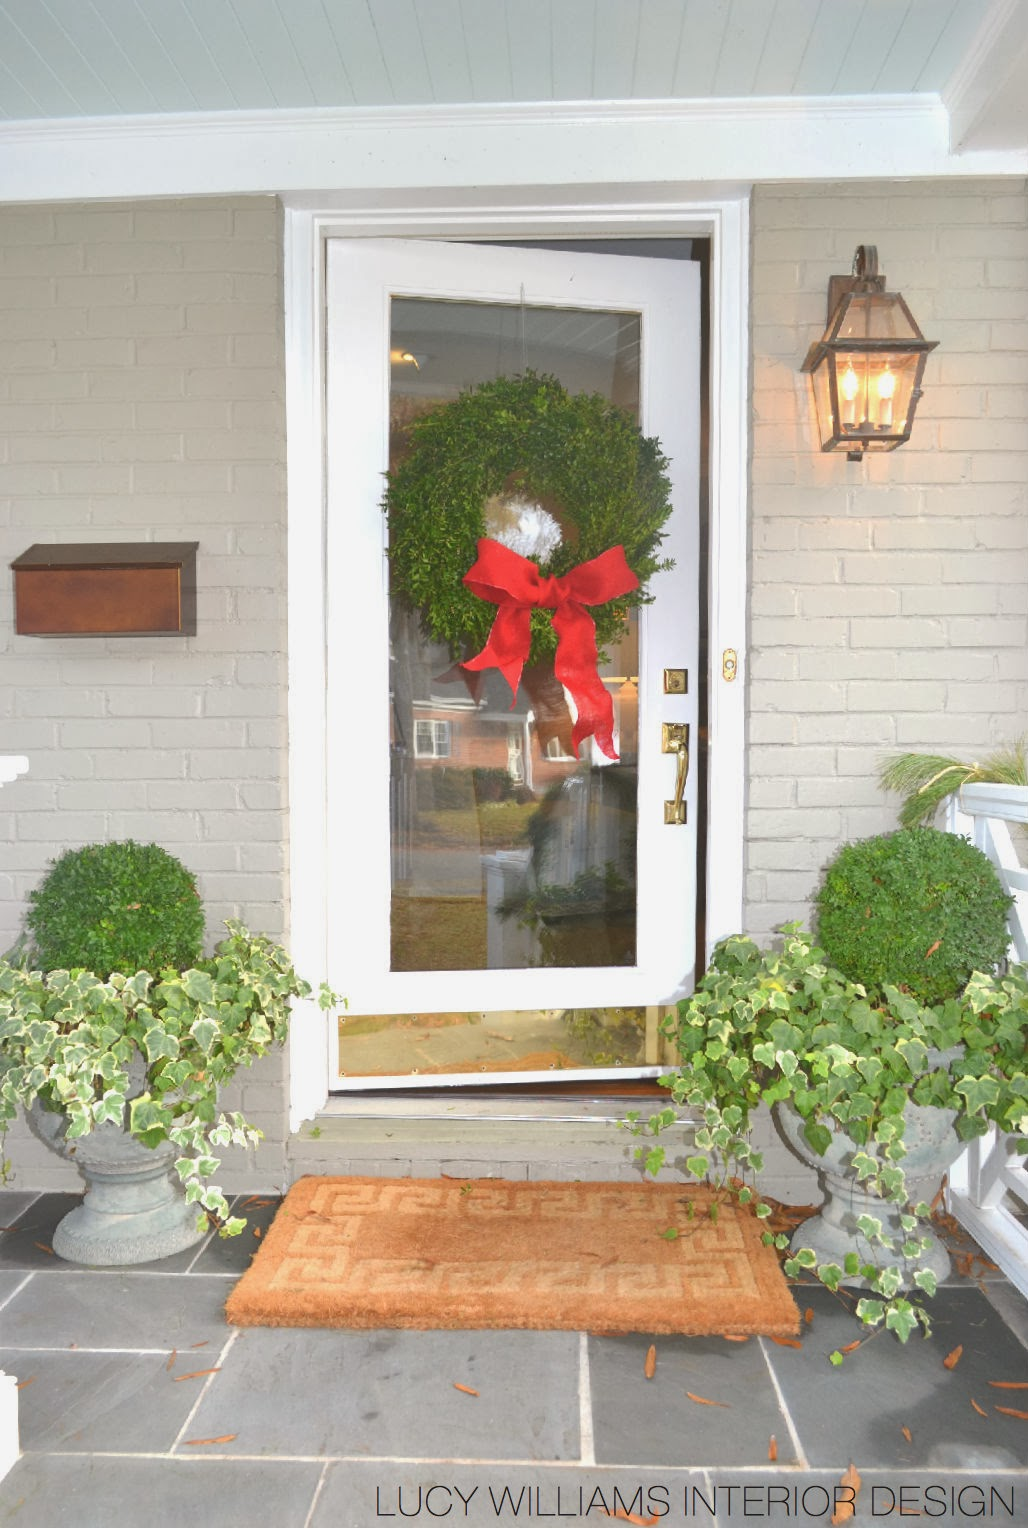 Lucy williams interior design blog christmas decor at for Lucy williams interiors